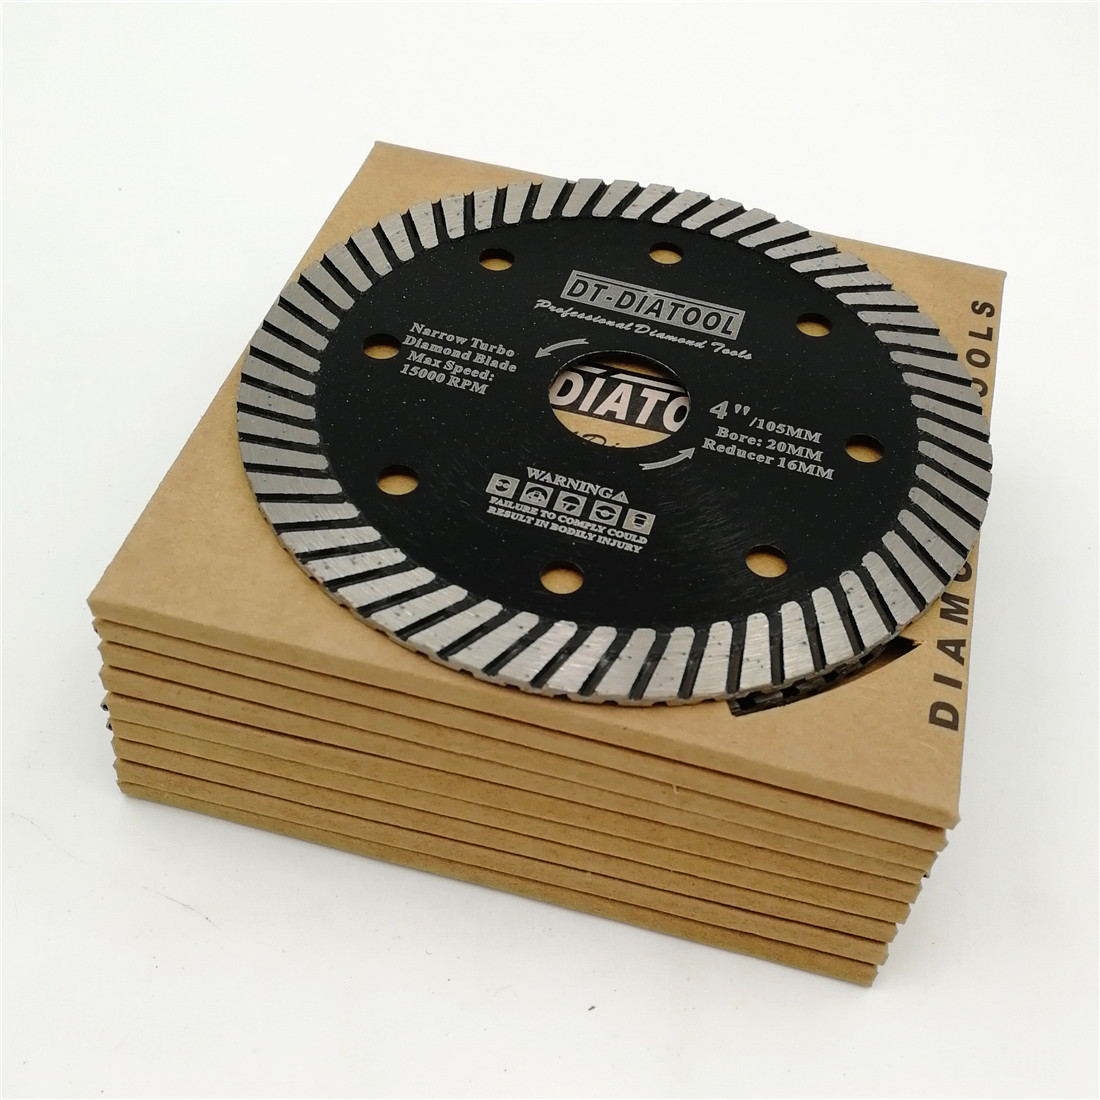 DT-DIATOOL 10pcs Dry Or Wet Professional Narrow Turbo Diamond Saw Blade Cutting Disc For Stone Granite Masonry Block Concrete